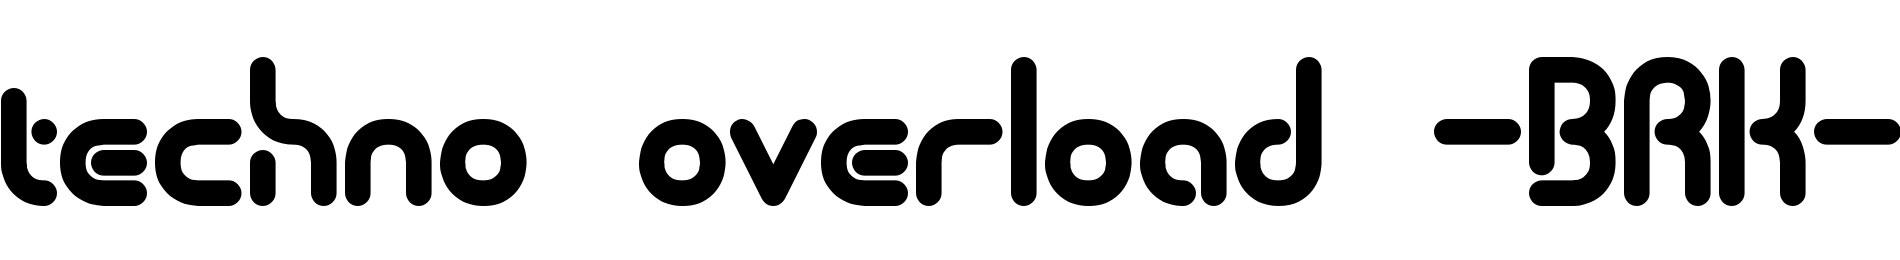 techno overload -BRK-